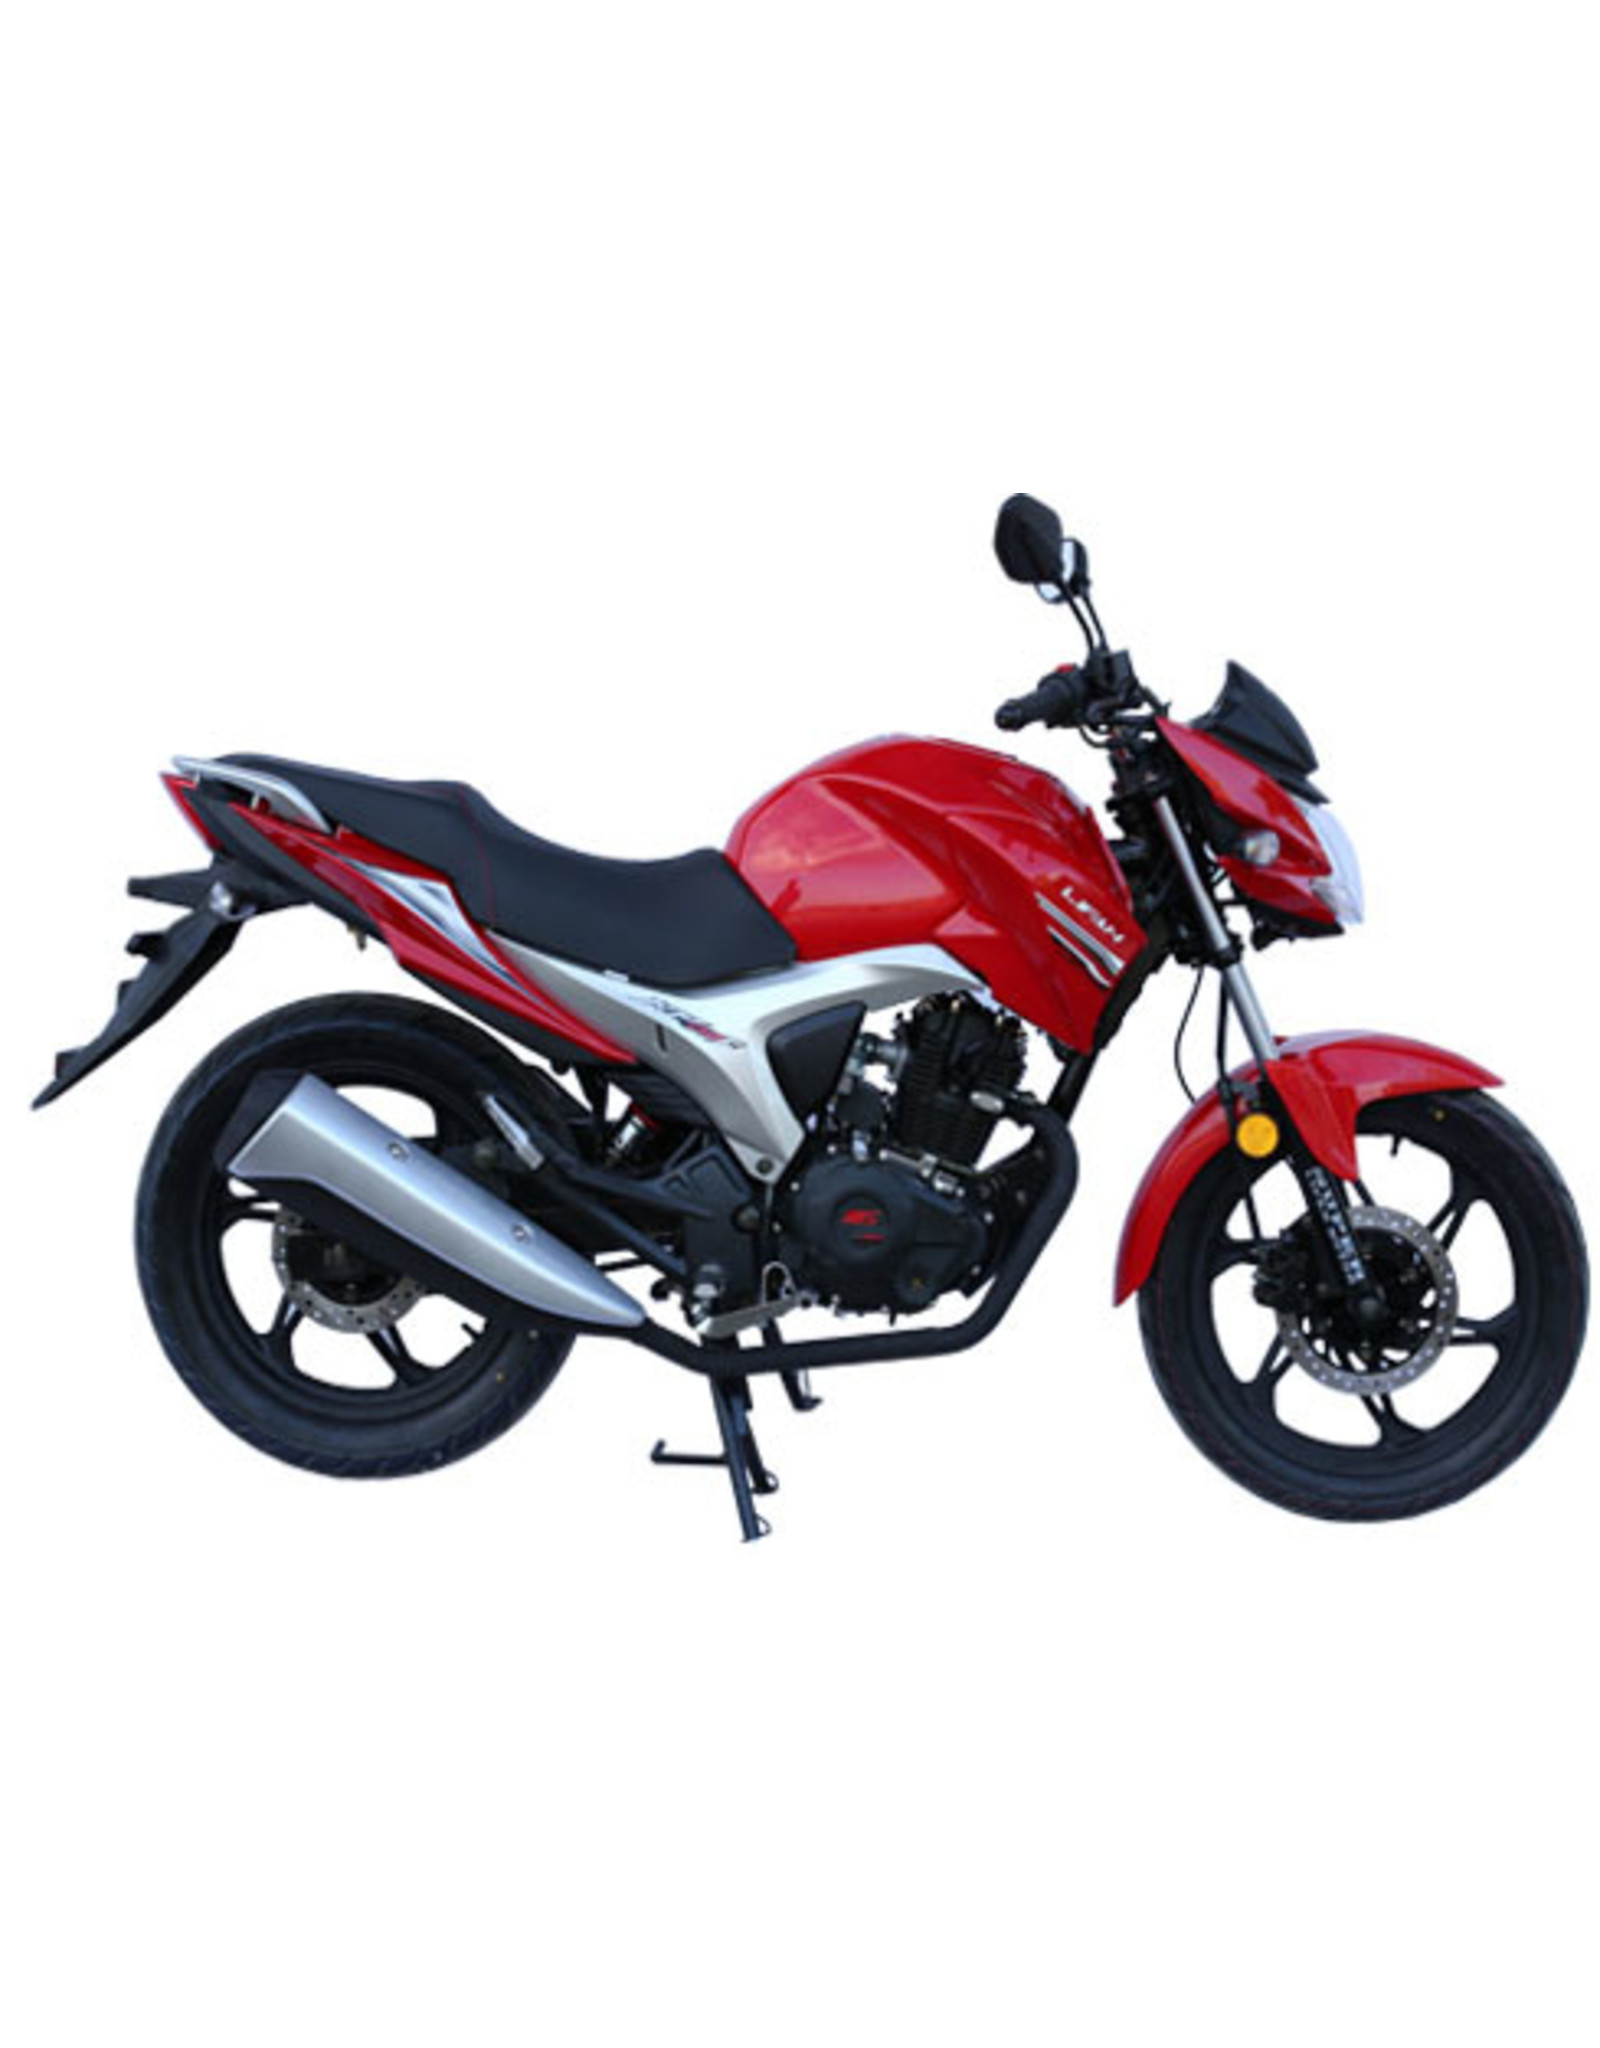 Bike - Street 150cc Lifan Red LF150-10FRED